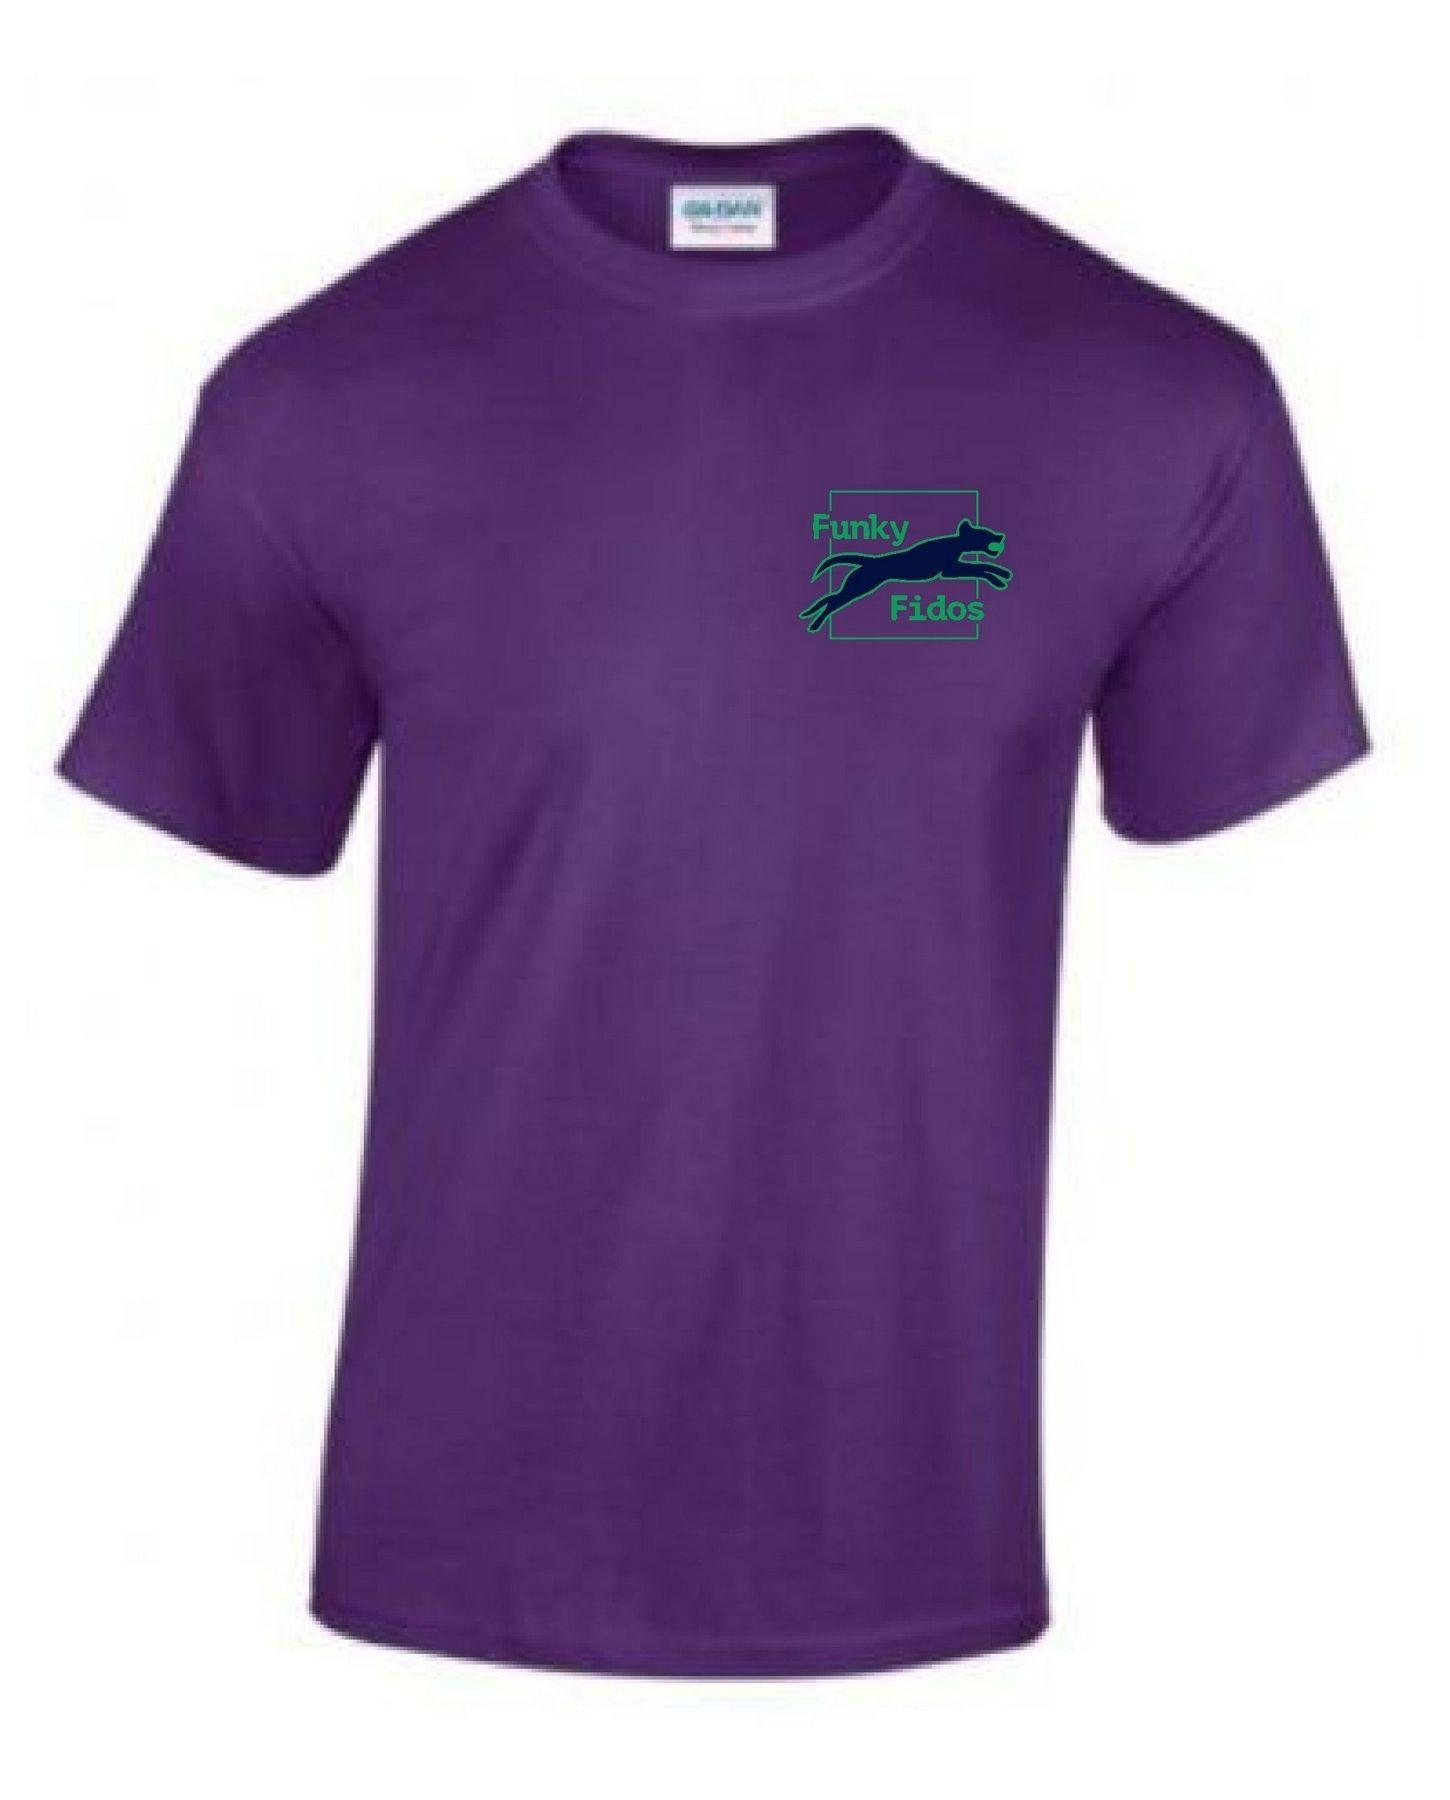 Funky Fidos – Tee (Purple)